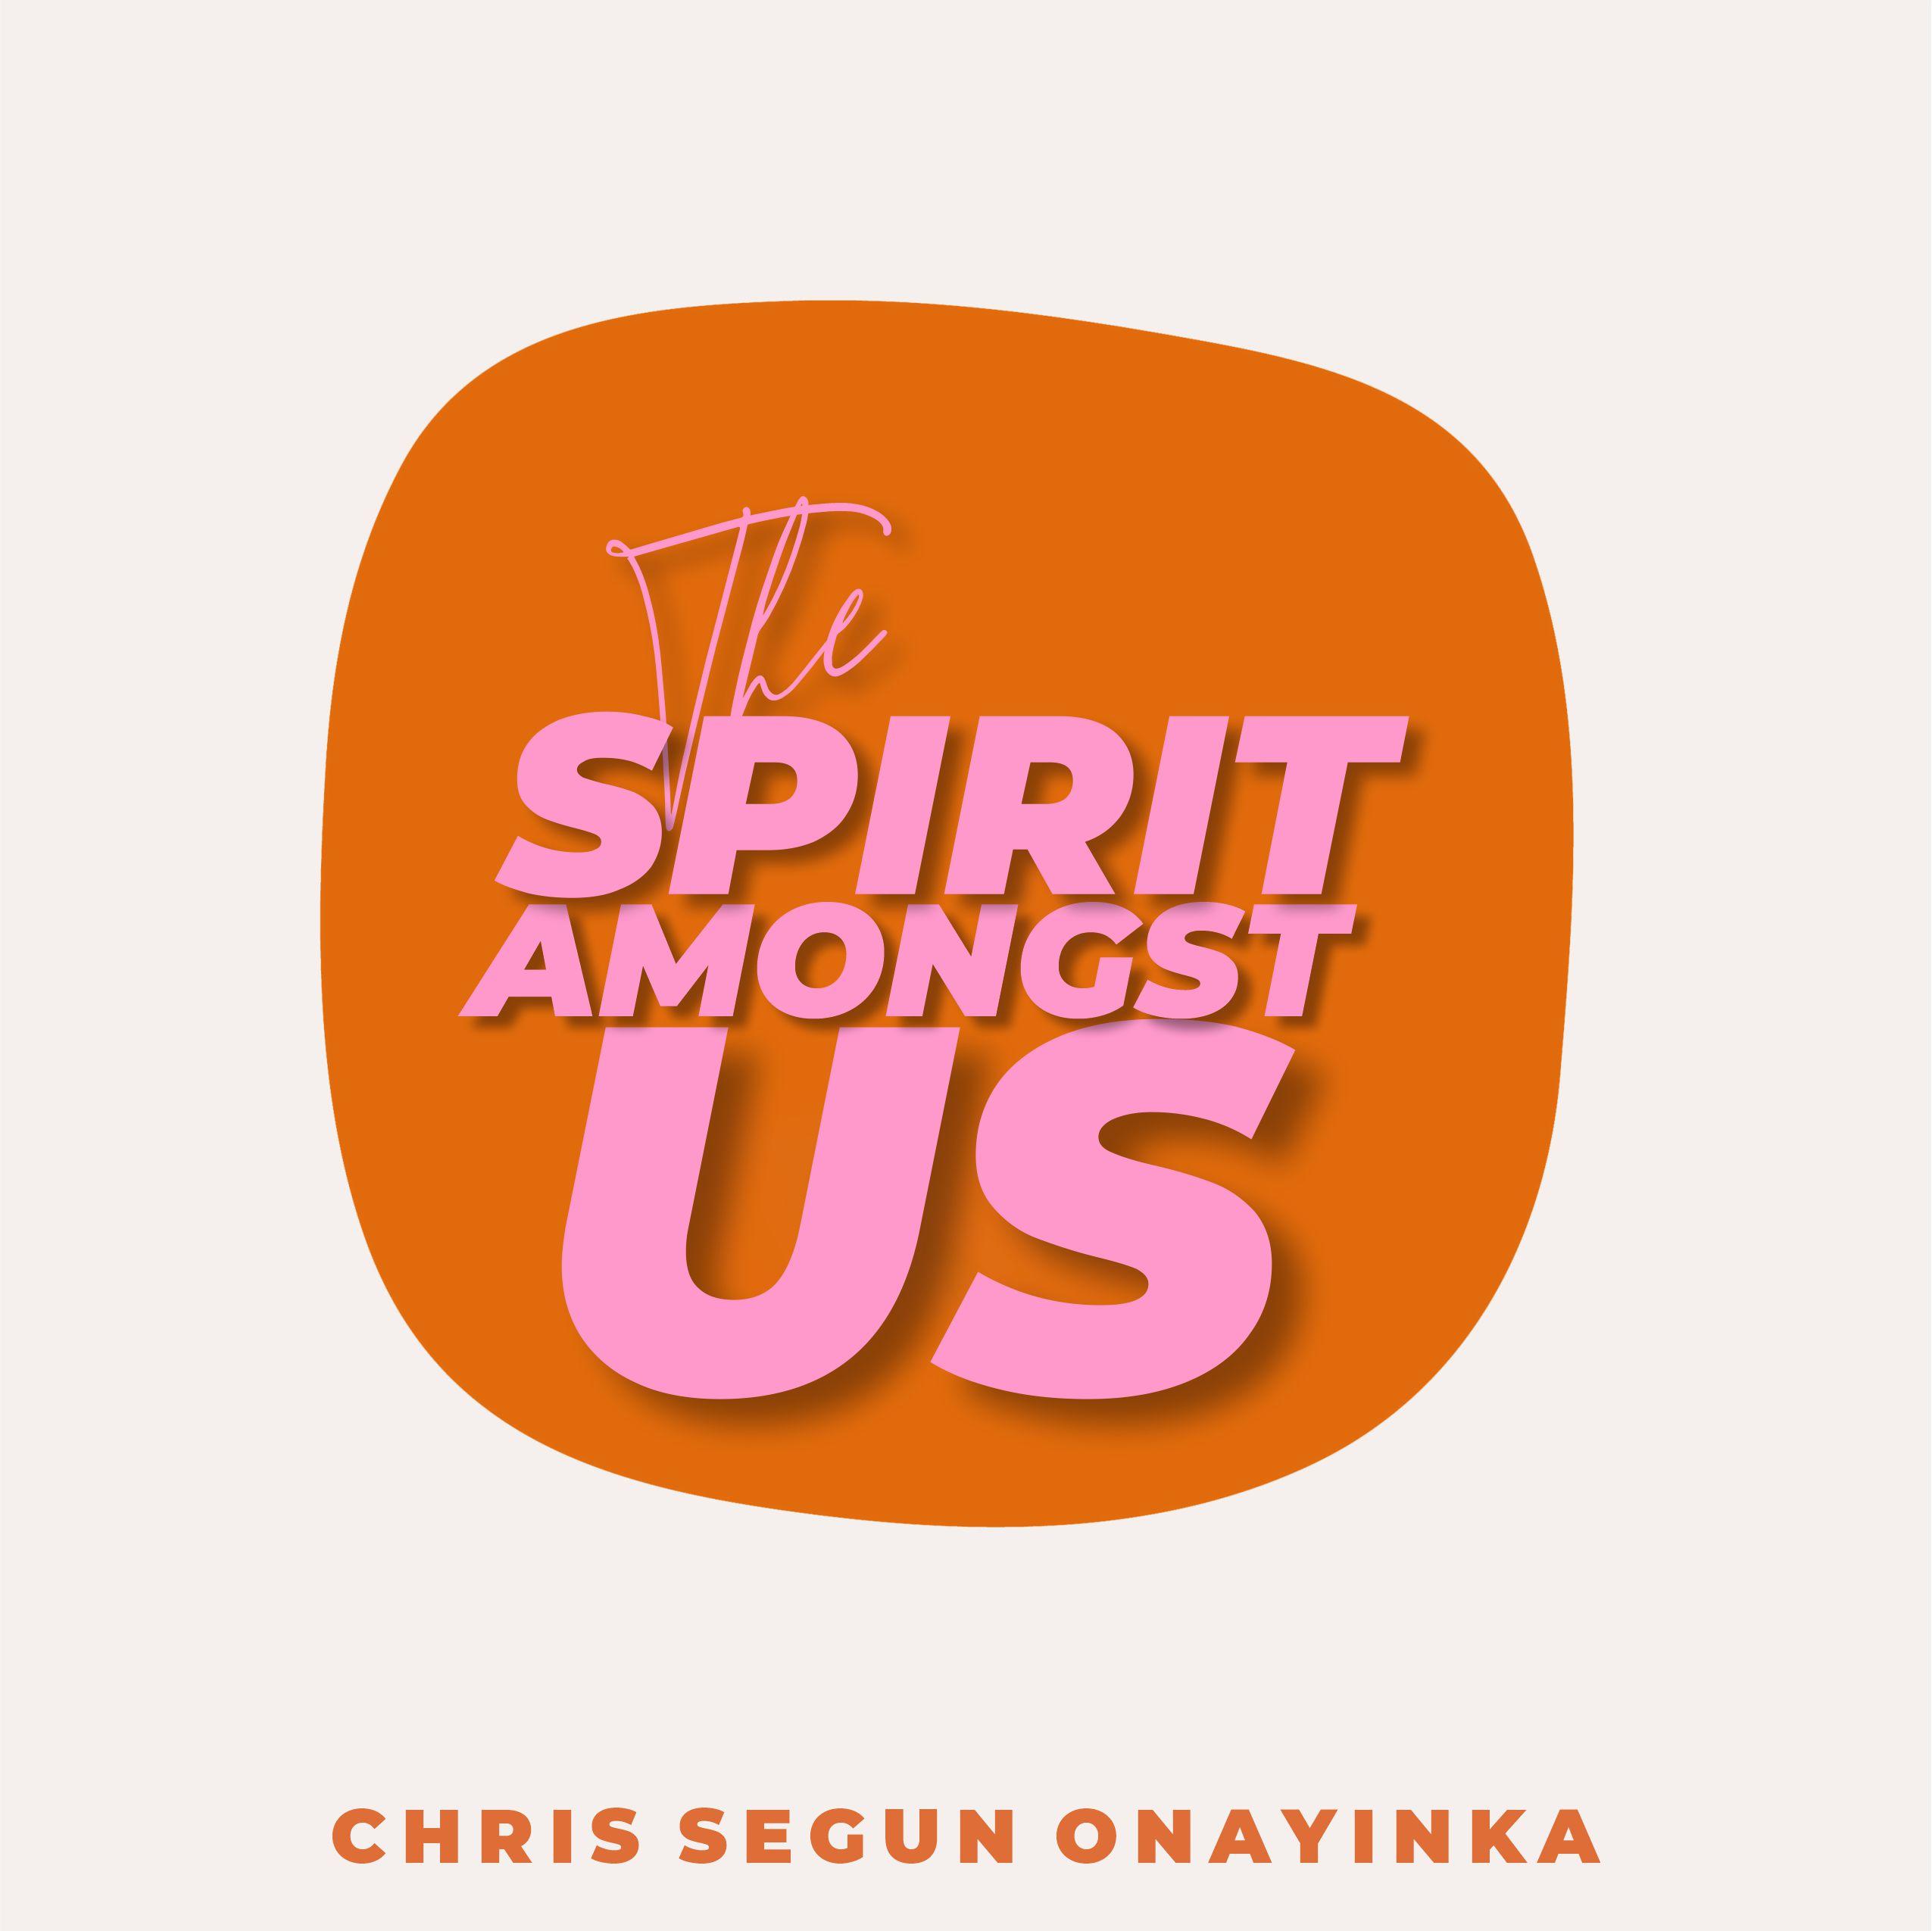 The Spirit amongst us